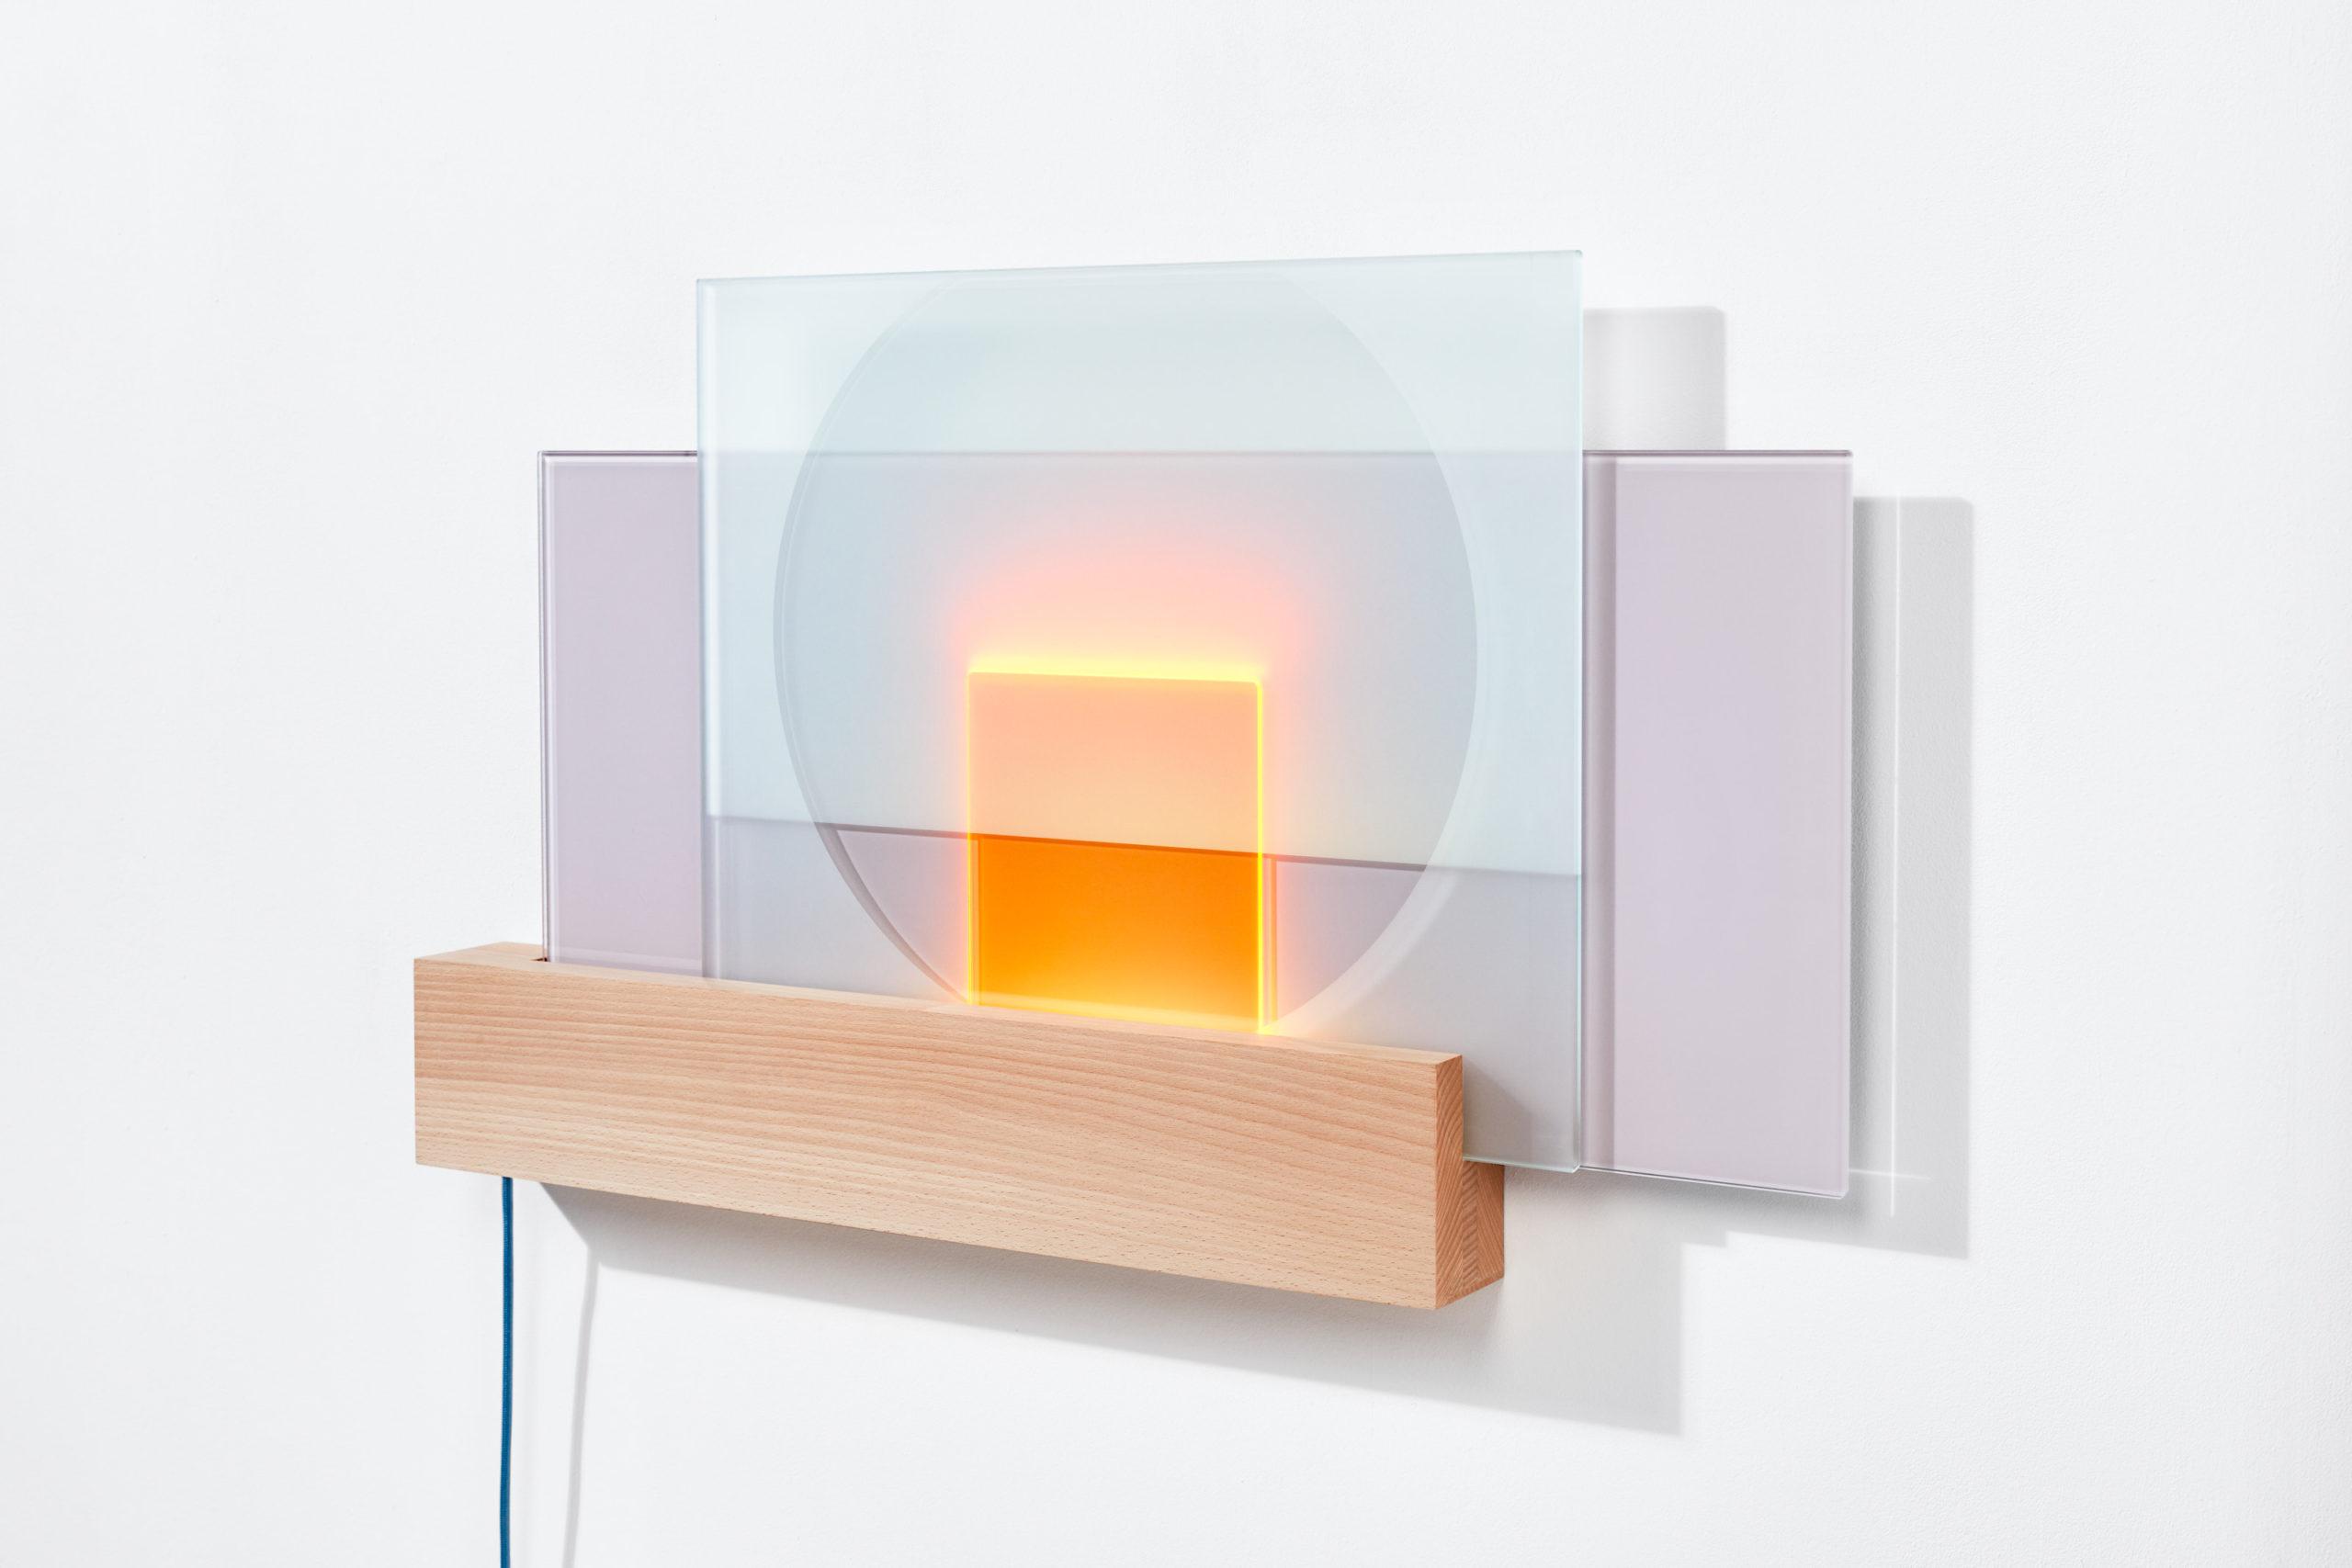 LIUW II – Studio Hedwich Hooghiemstra